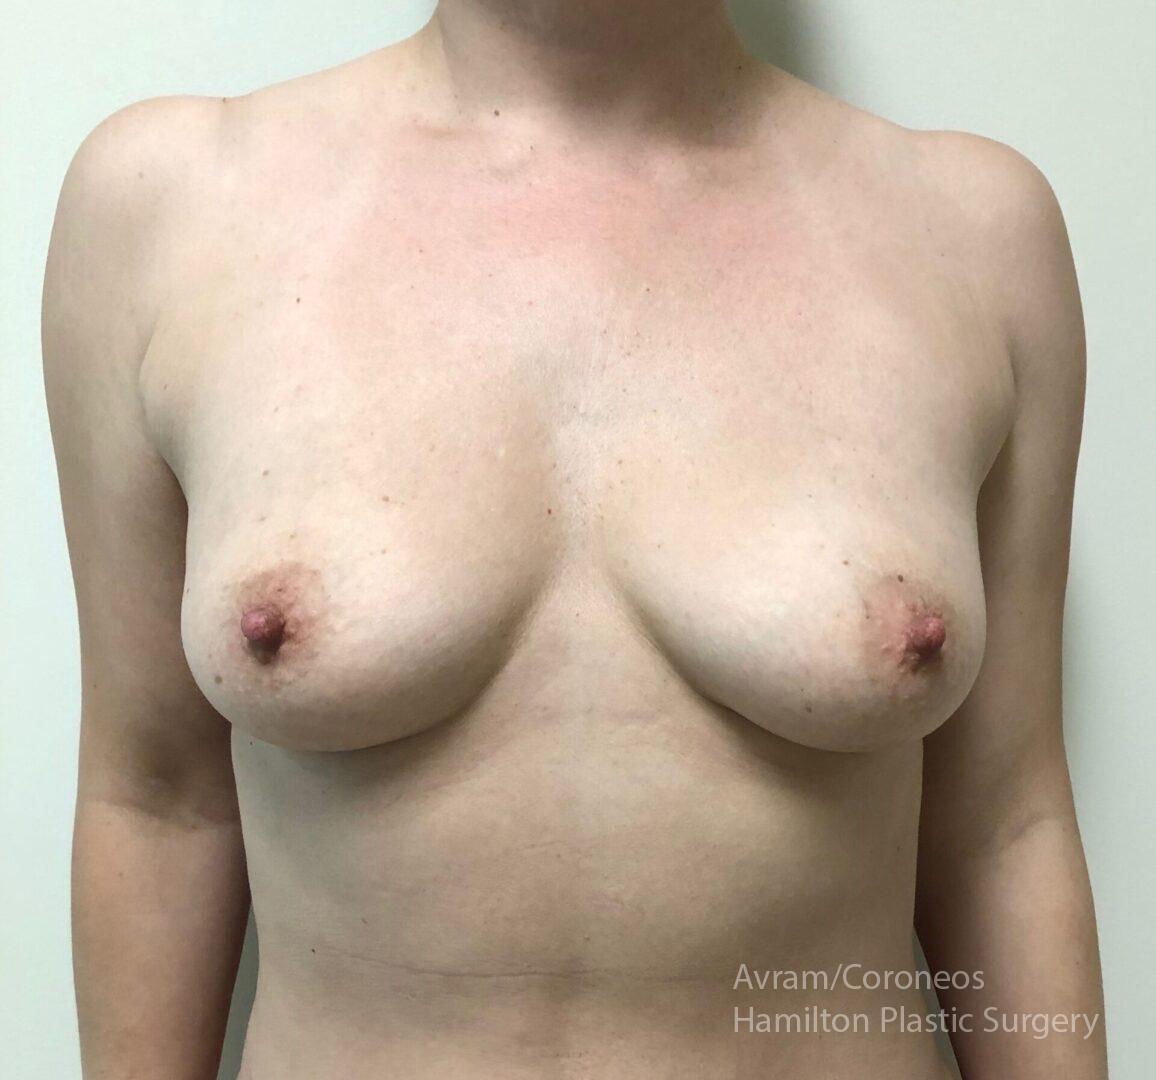 Dr. Ronen Avram Cosmetic & Reconstructive Breast Surgeon